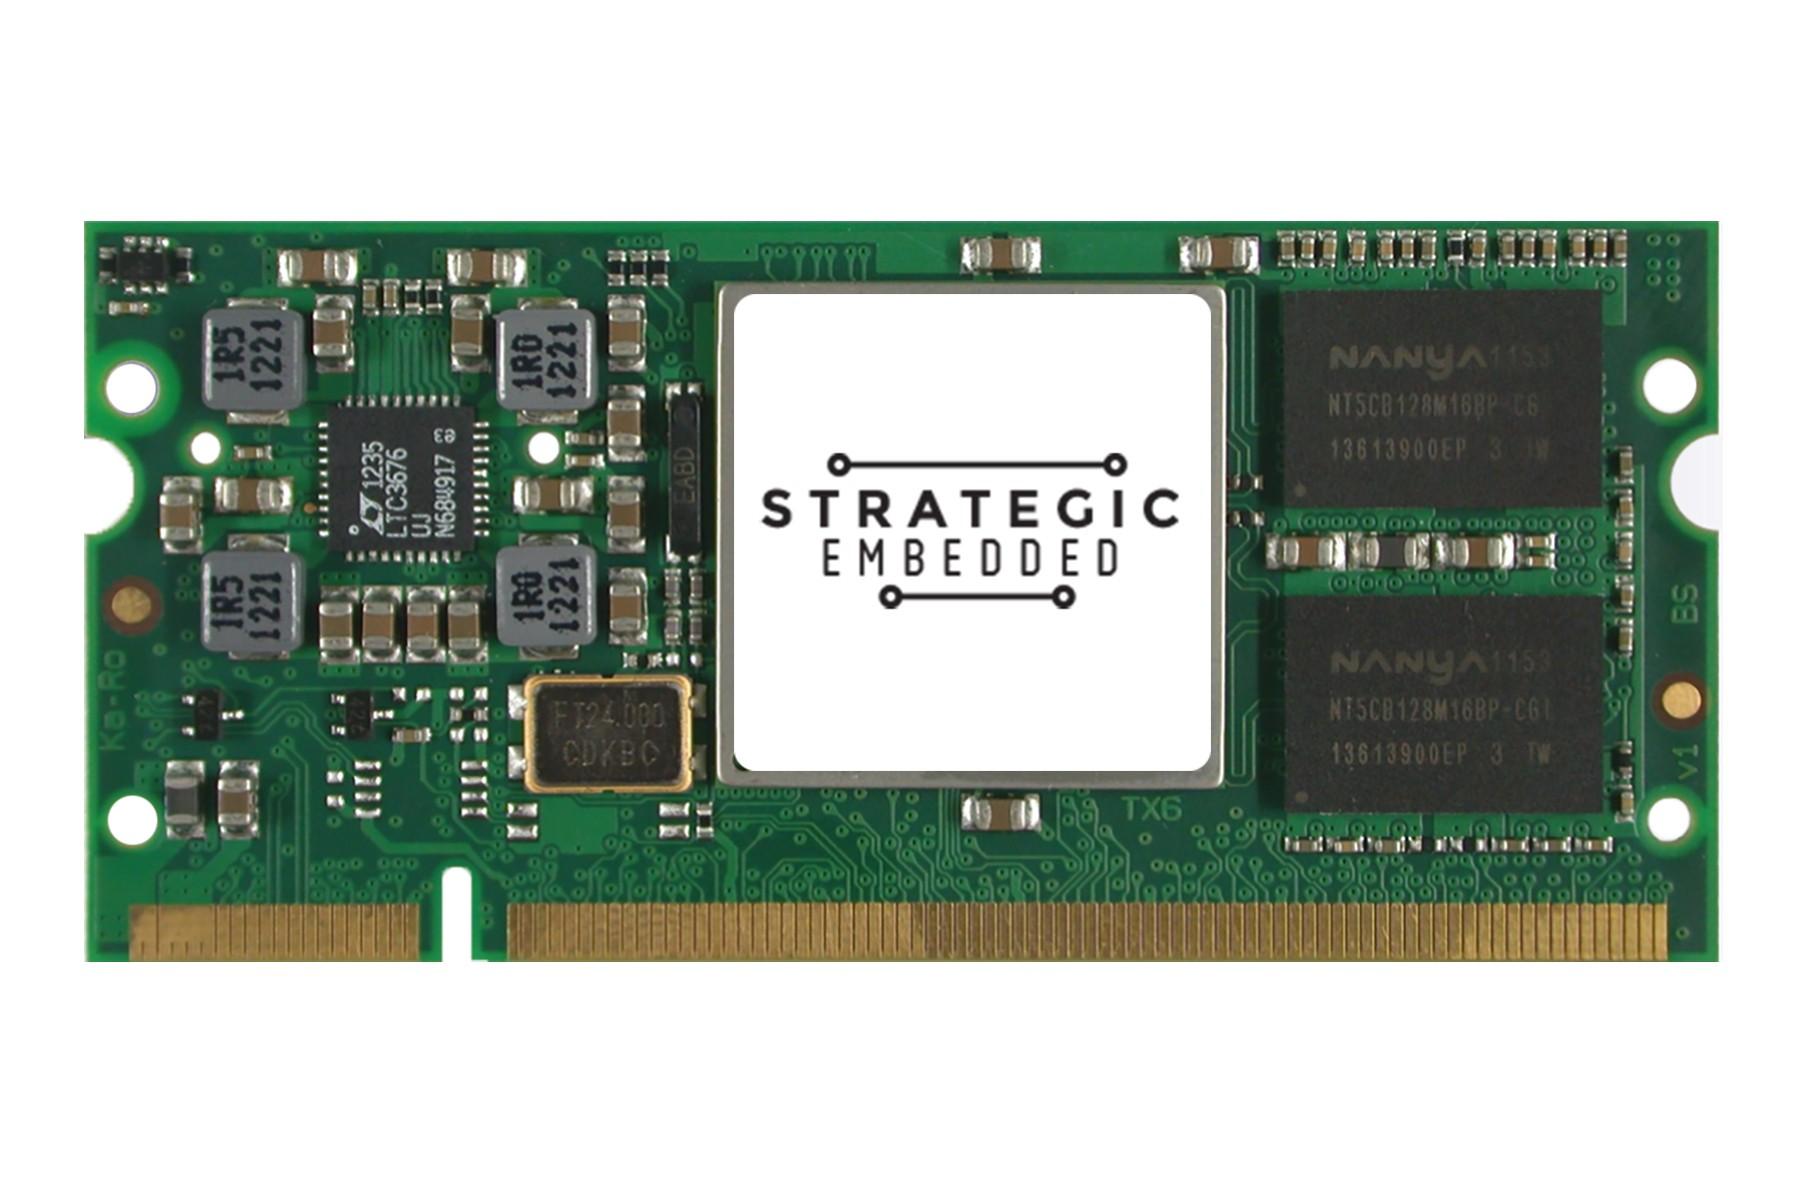 Tx6q Tx6q 1036 1000mhz Quad Cortex A9 1gb 8gb Sodimm